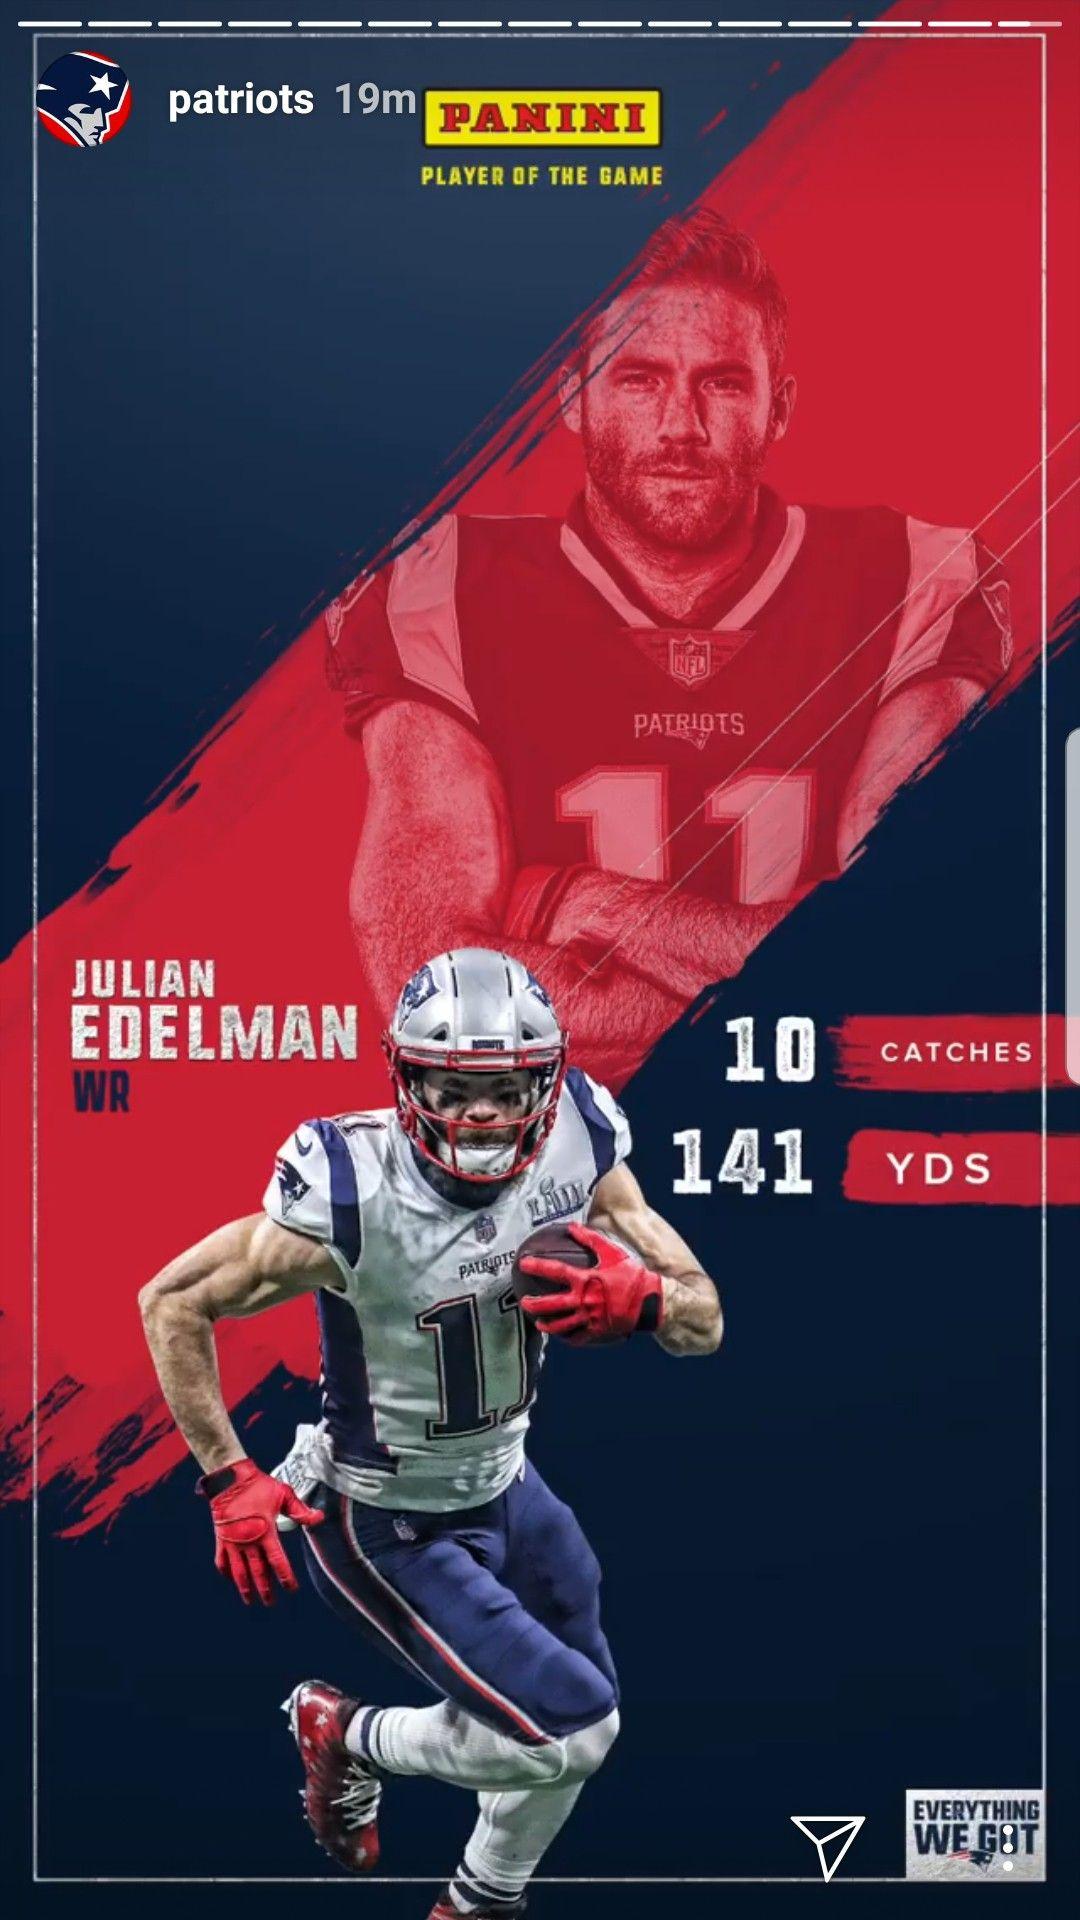 Pin By Maria On Patriots Patriots Julian Edelman New England Patriots New England